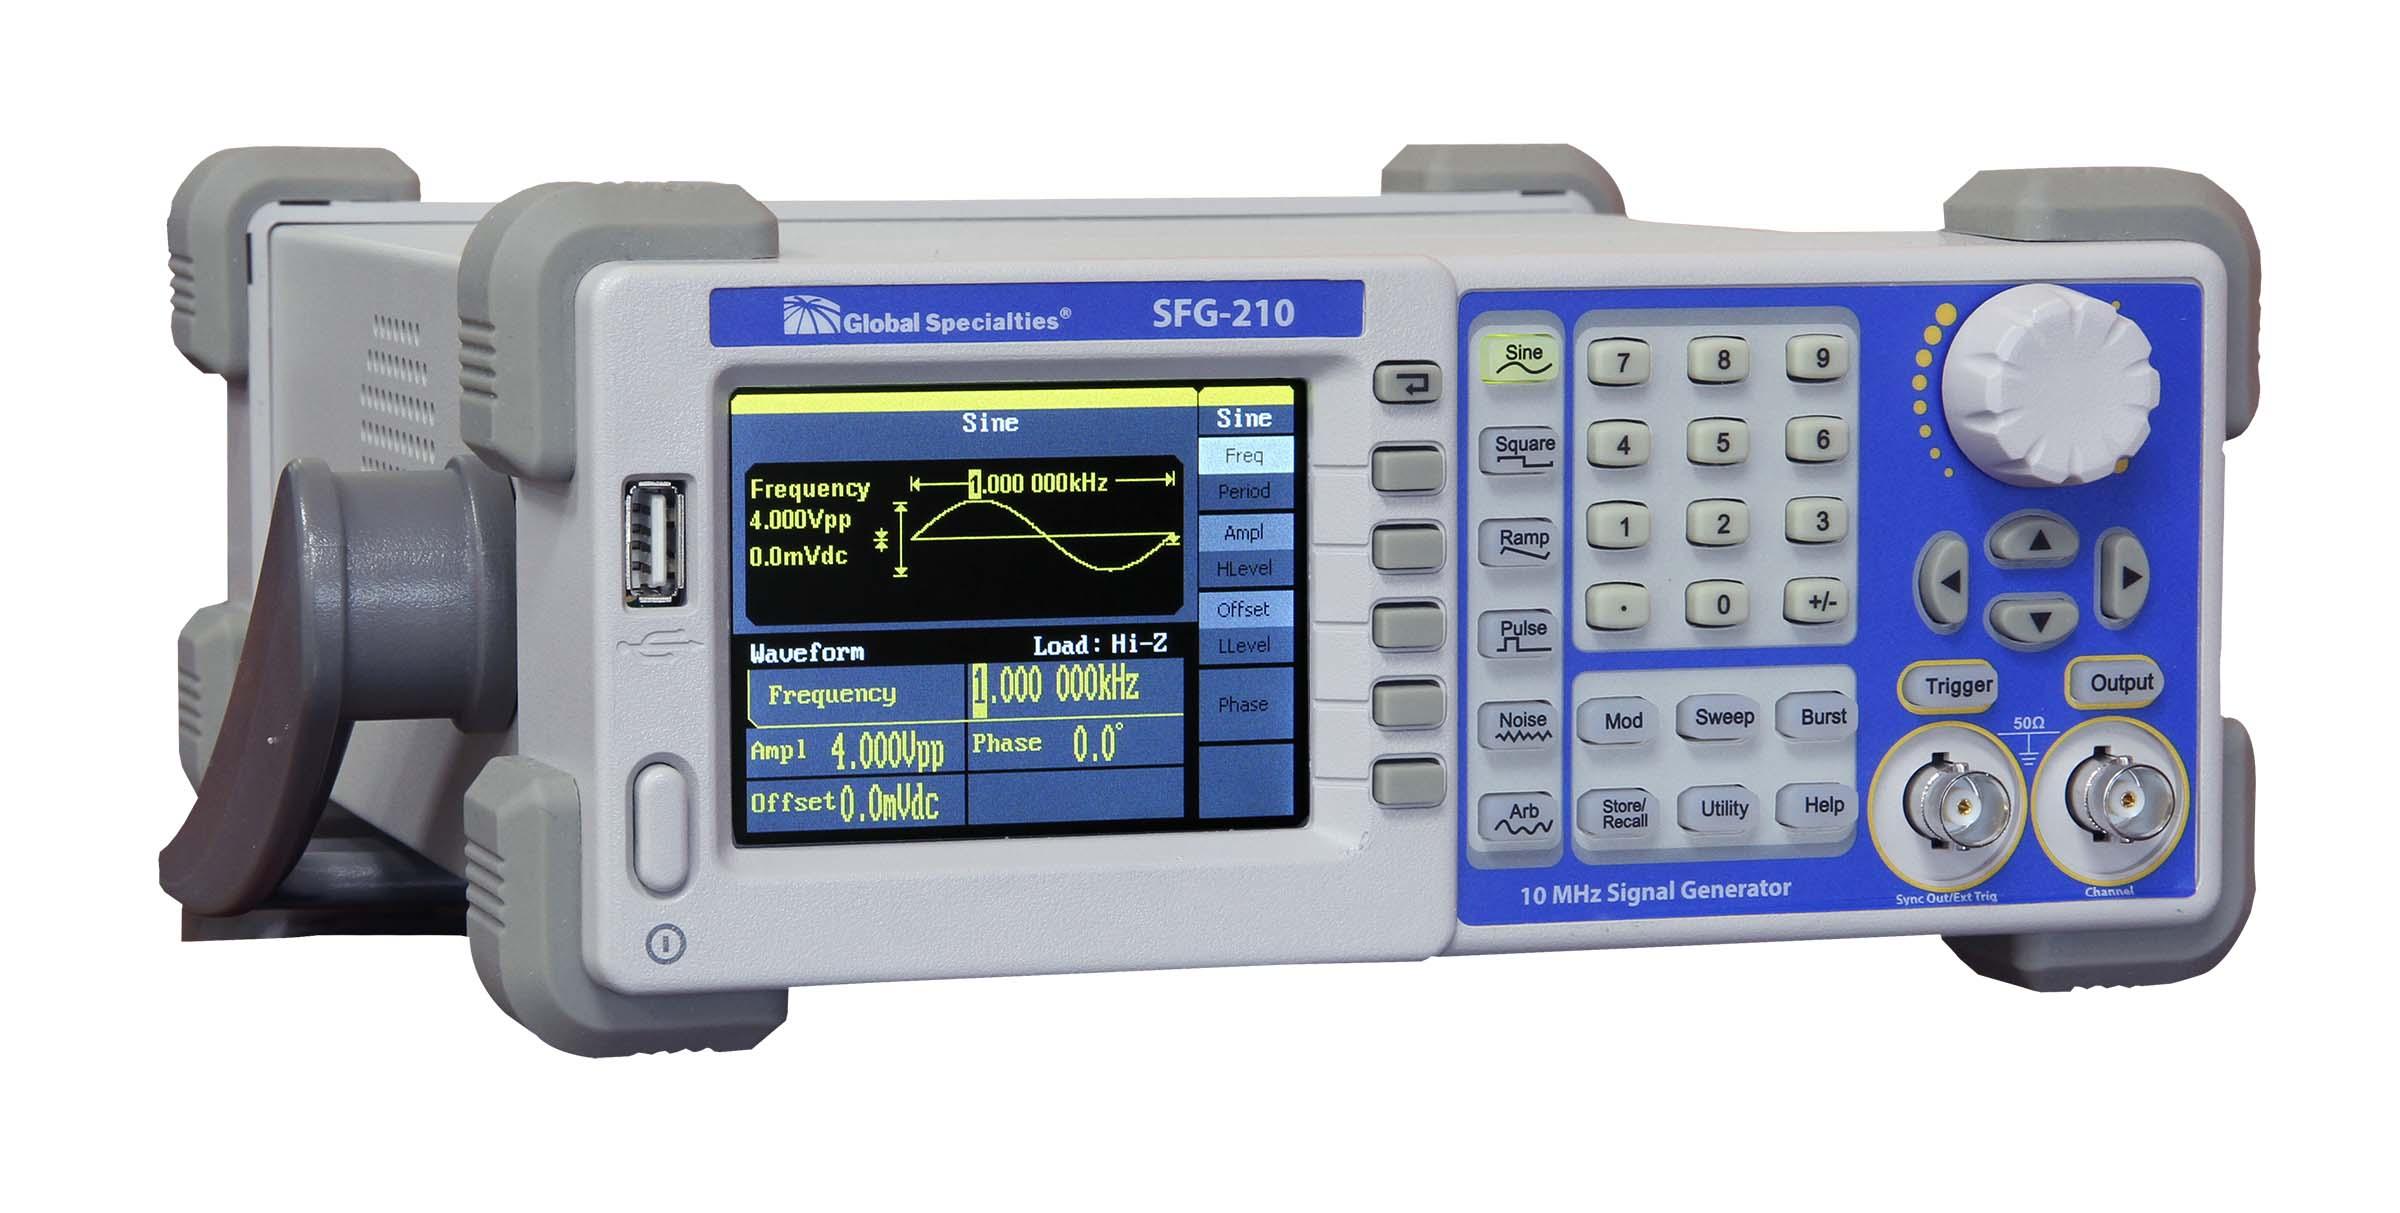 Global Specialties SFG-205 5 MHz Arbitrary/Function Signal Generator Photo